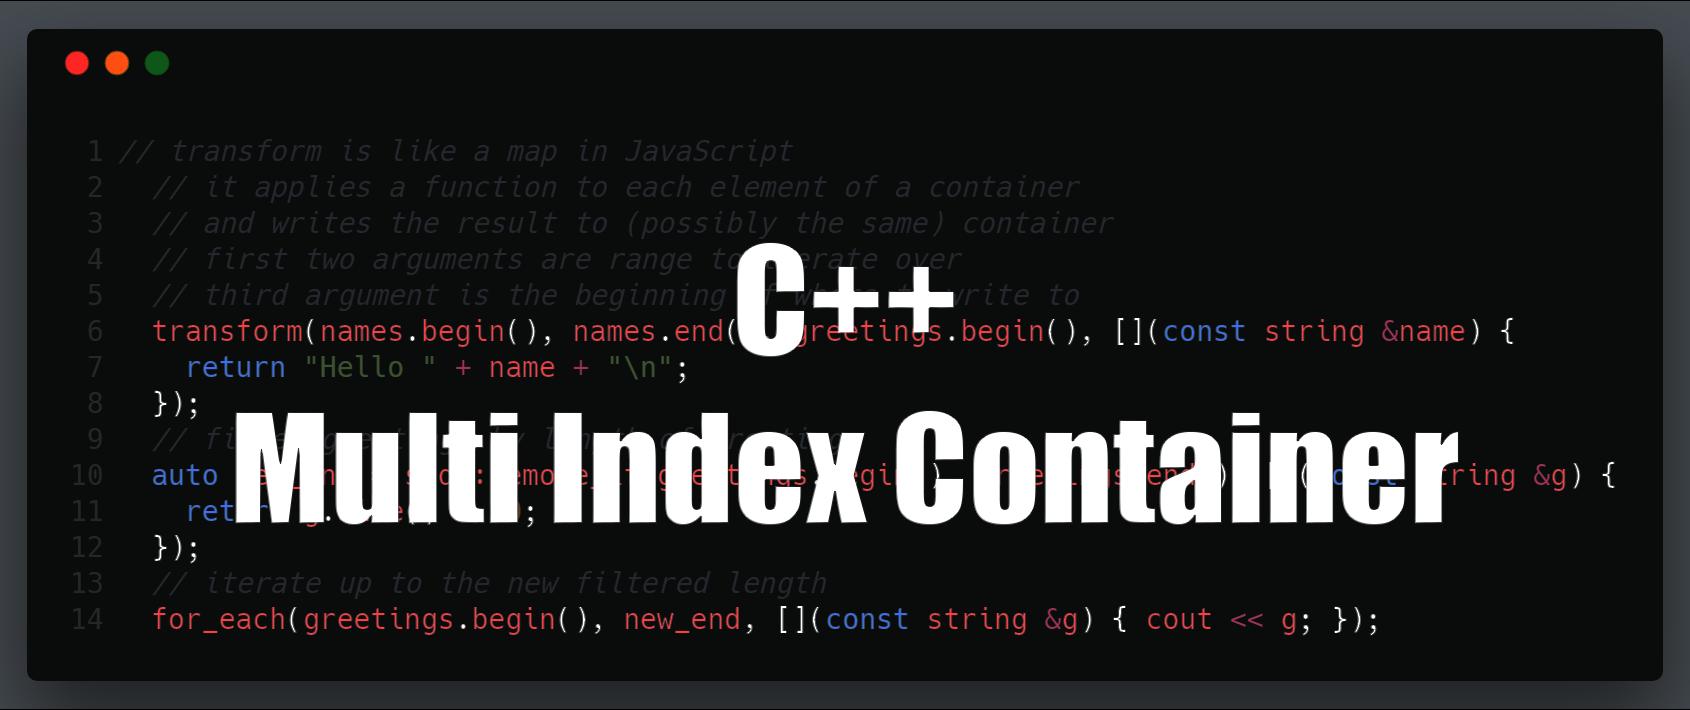 C++ Guide for EOS Development - Multi-Index Container   cmichel